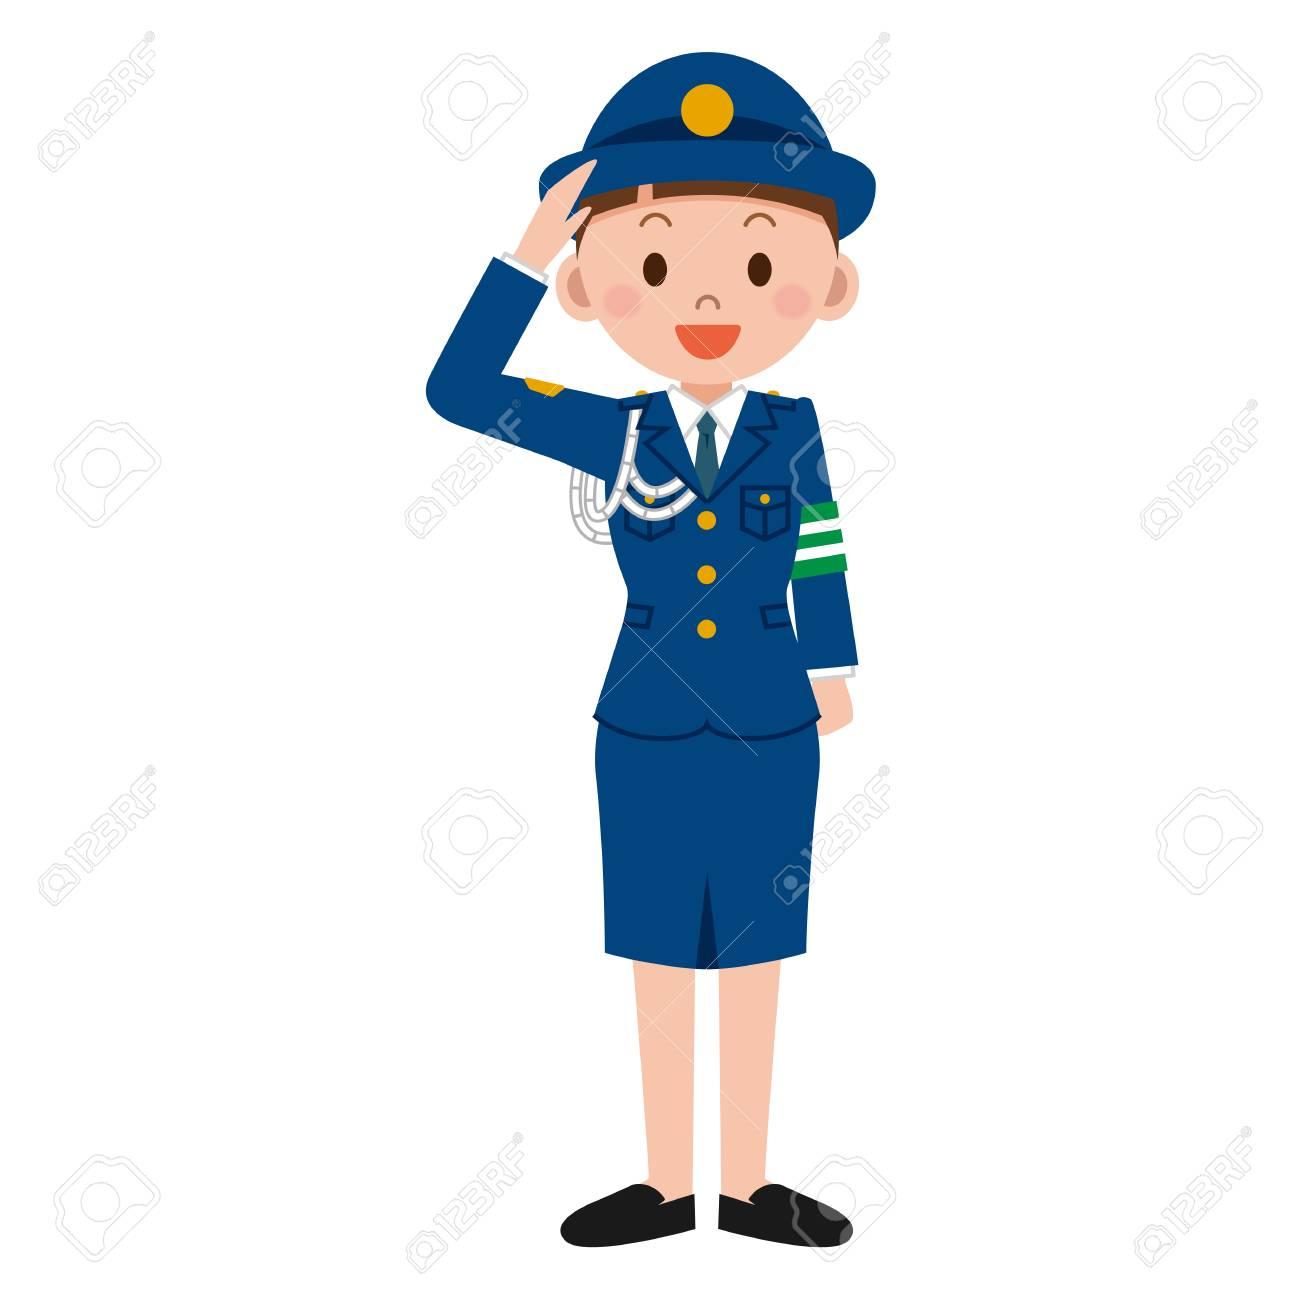 Policewoman clipart picture transparent Female Police Clipart | Free download best Female Police ... picture transparent